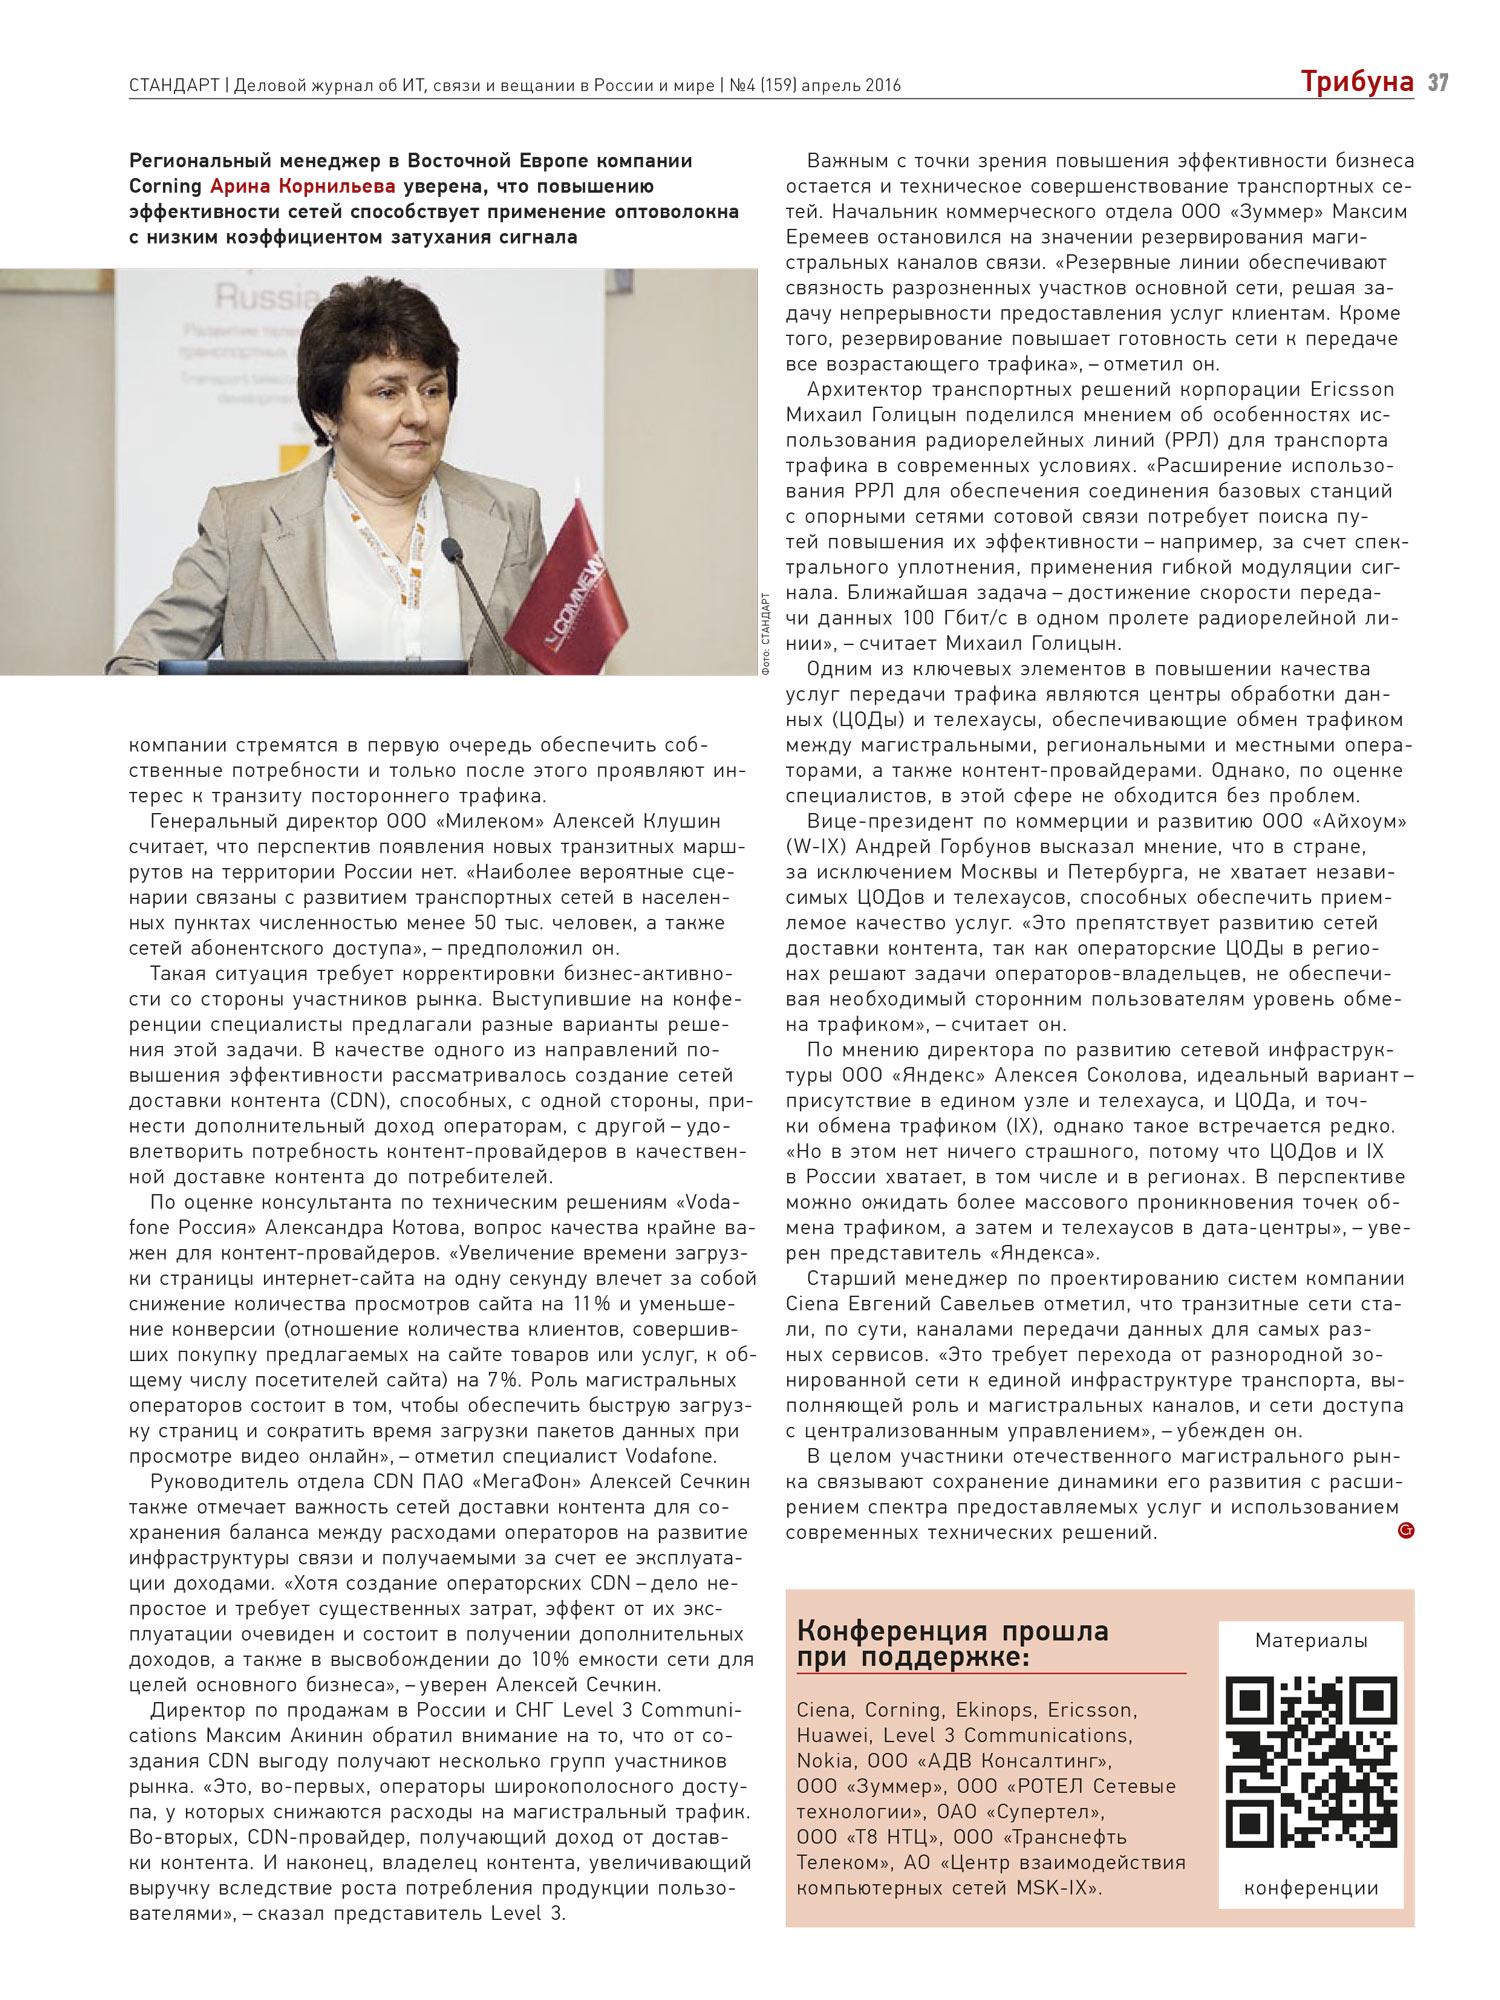 Журнал «Стандарт». Транспортная трансформация, стр. 36 – 39